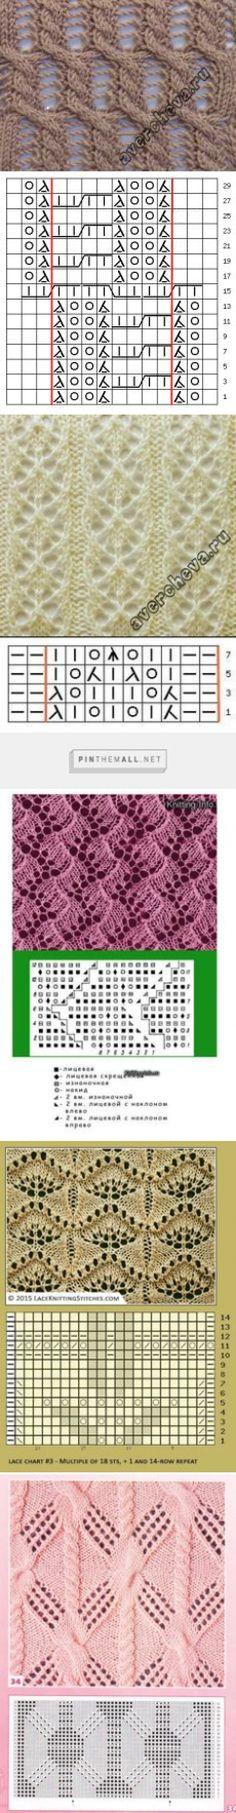 446 mejores imágenes de Tejidos | Knitting patterns, Crochet ...